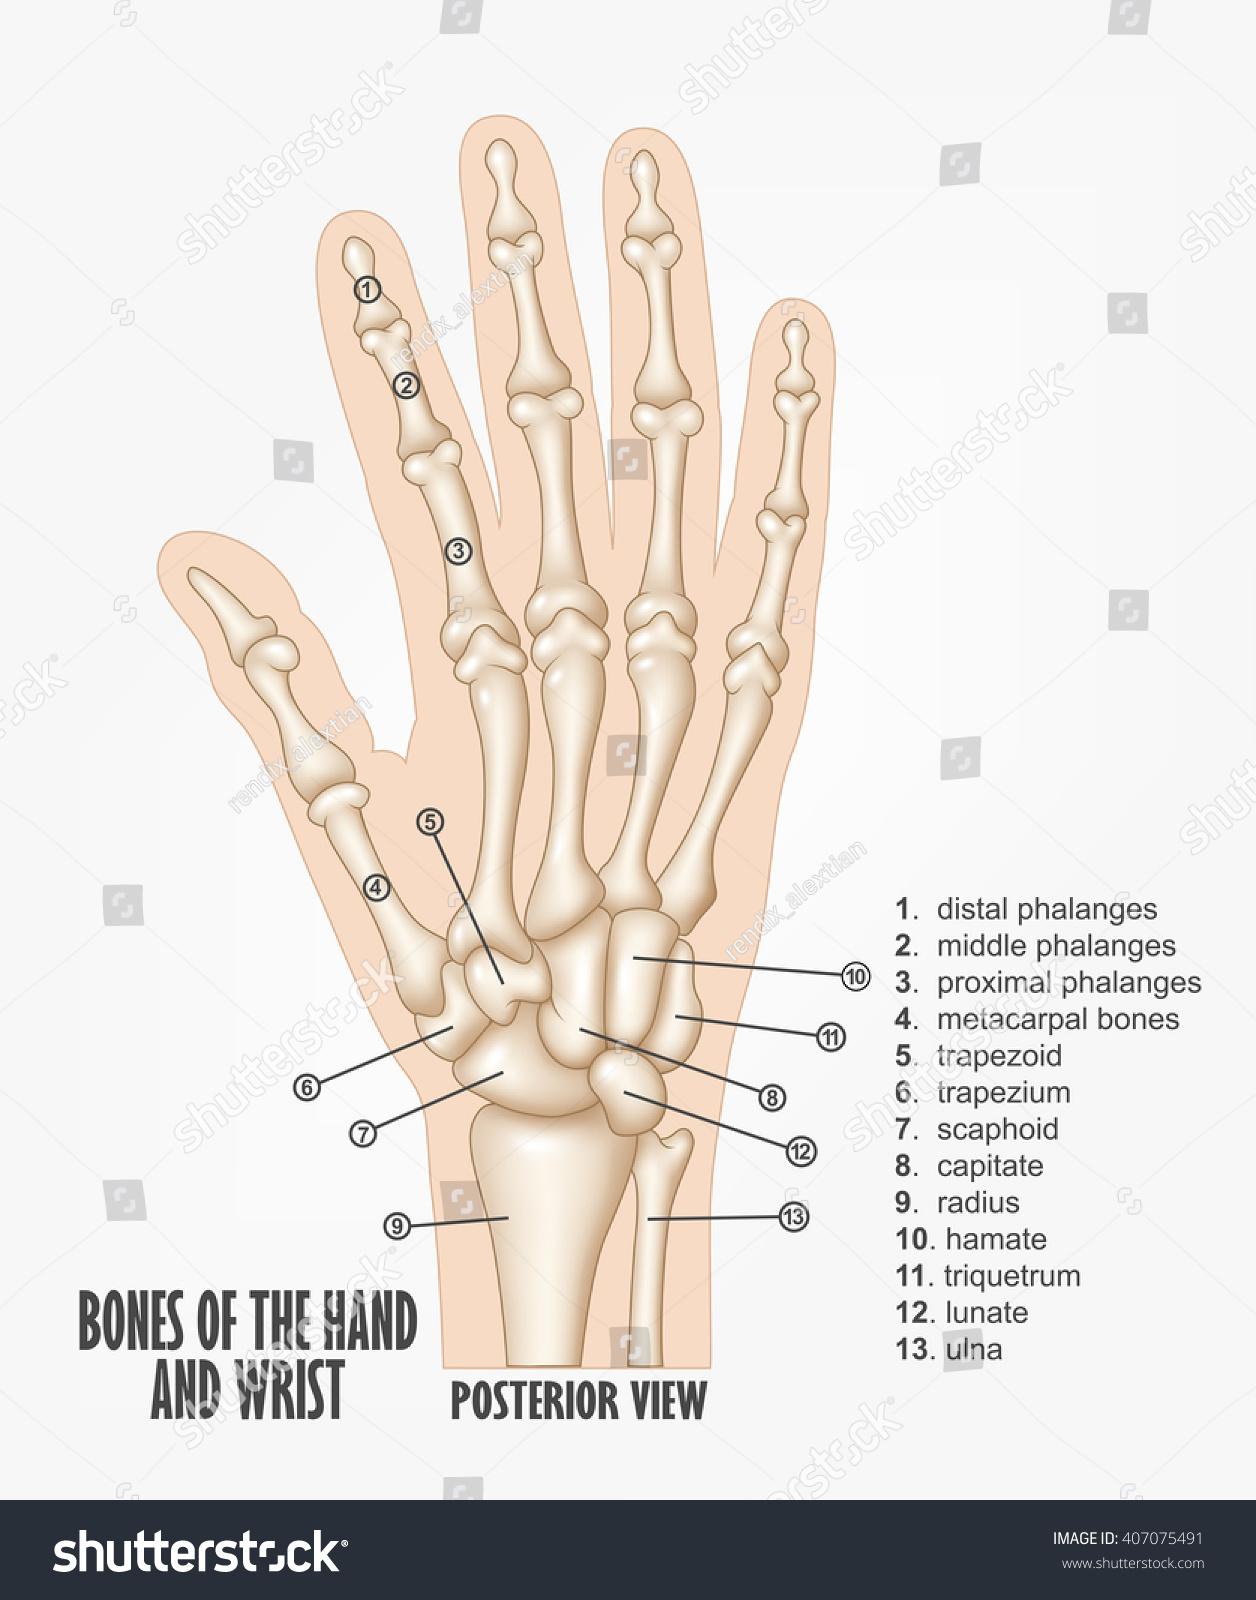 wrist and hand unlabeled diagram yamaha fj1200 wiring bones anatomy stock illustration royalty free of the